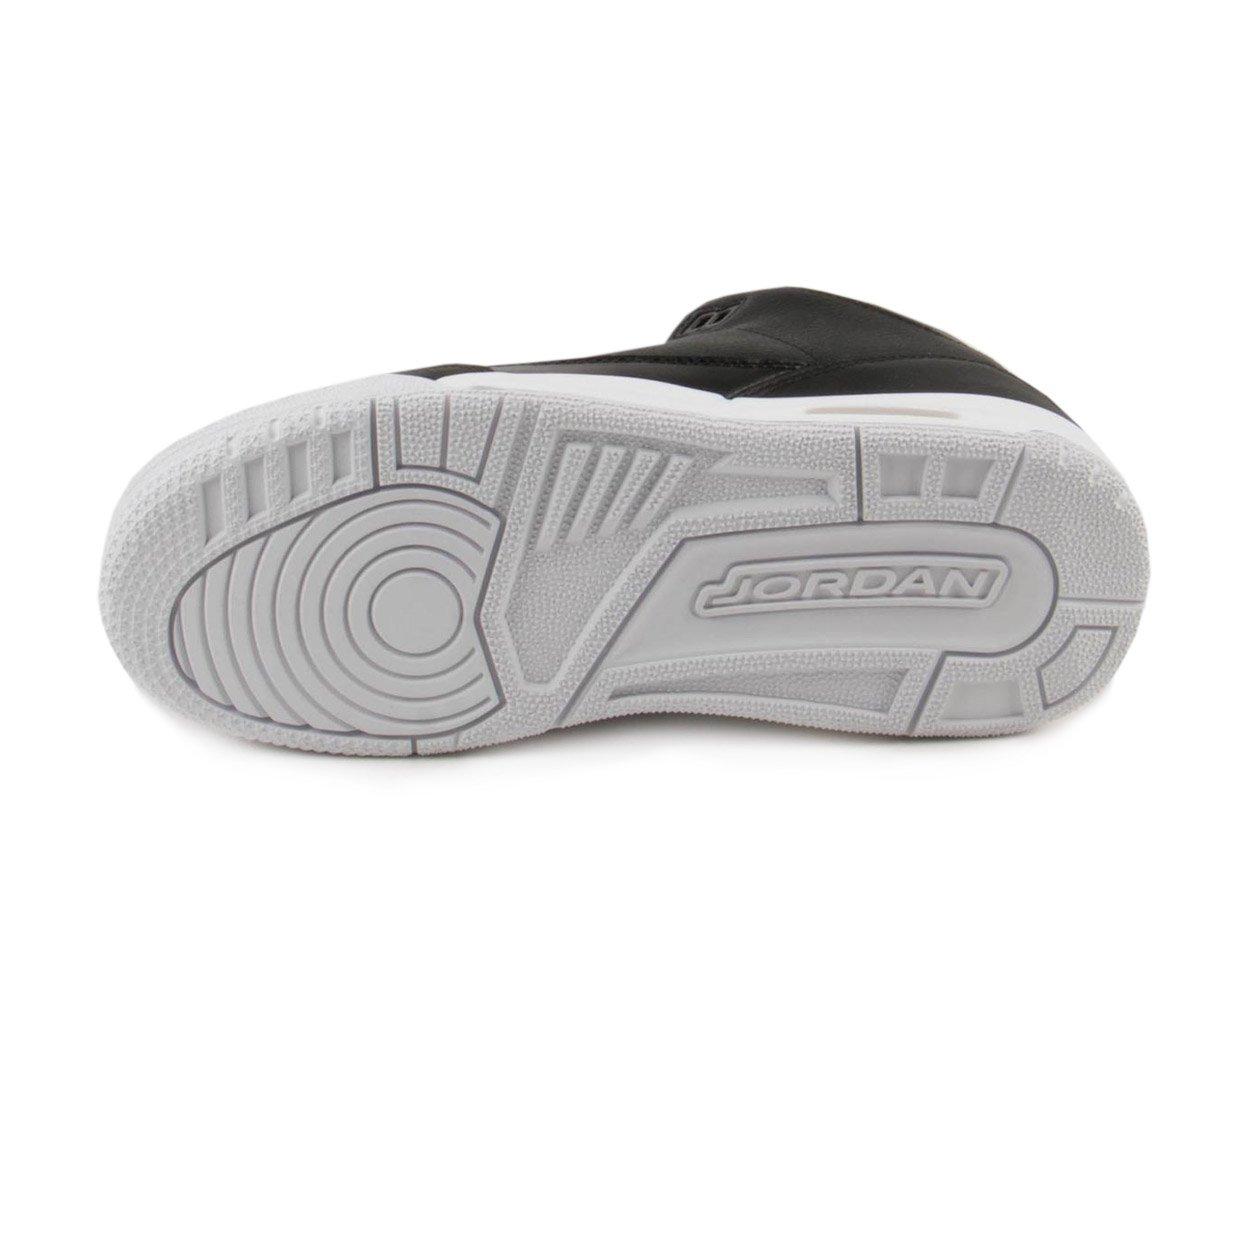 NIKE Jordan Air 3 Retro Bg Boys Basketball Shoes (7Y, Black/Black/White) by Jordan (Image #5)